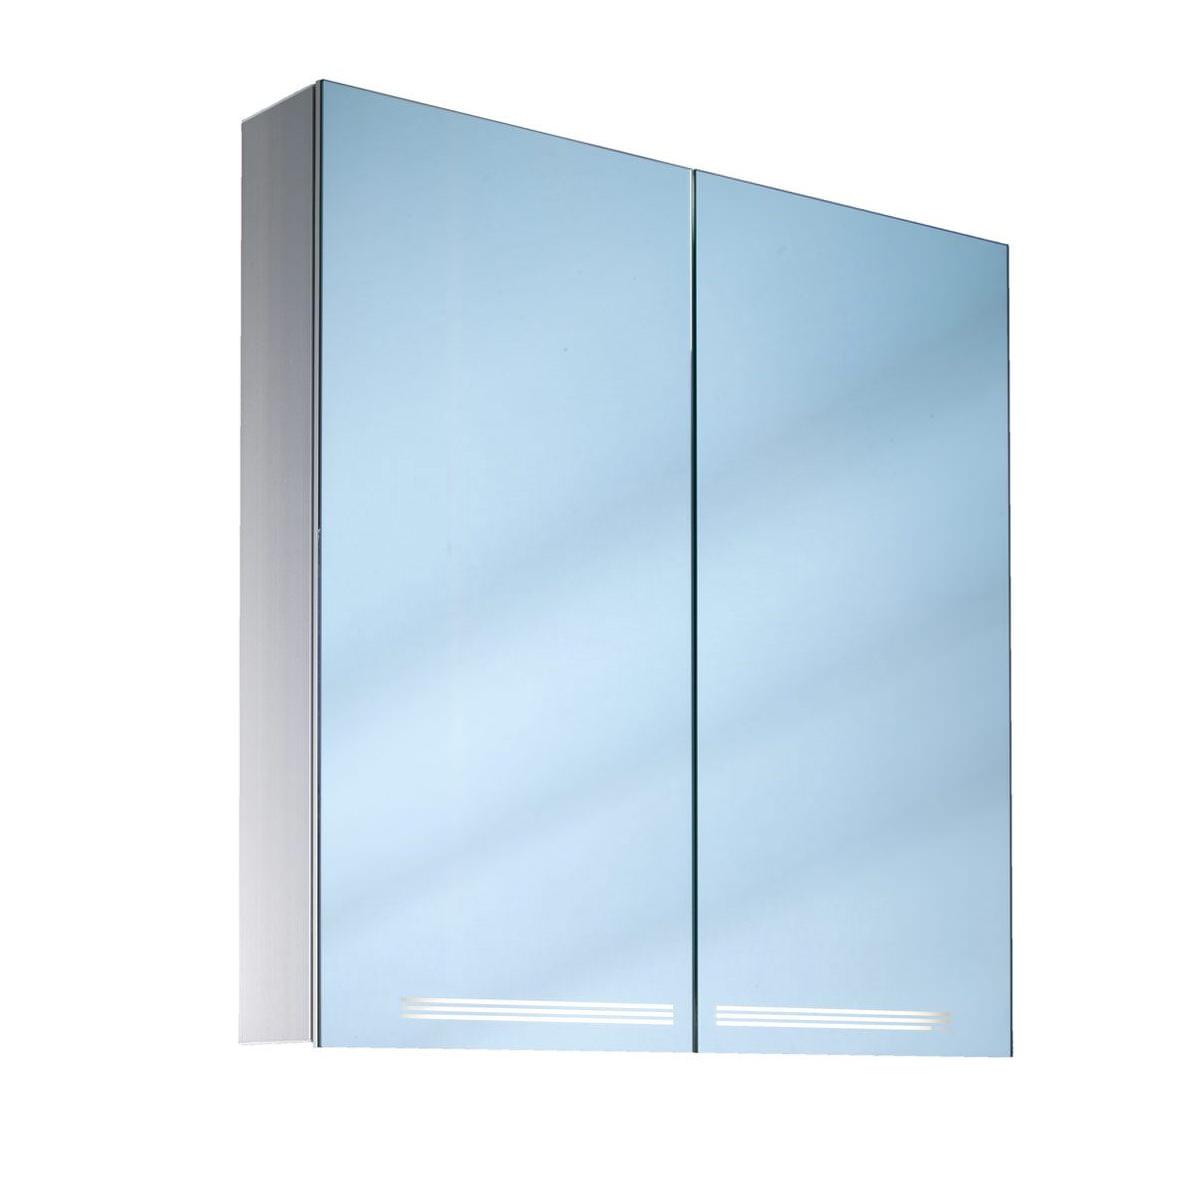 Schneider Graceline 2 Door 700mm Mirror Cabinet With Led Light